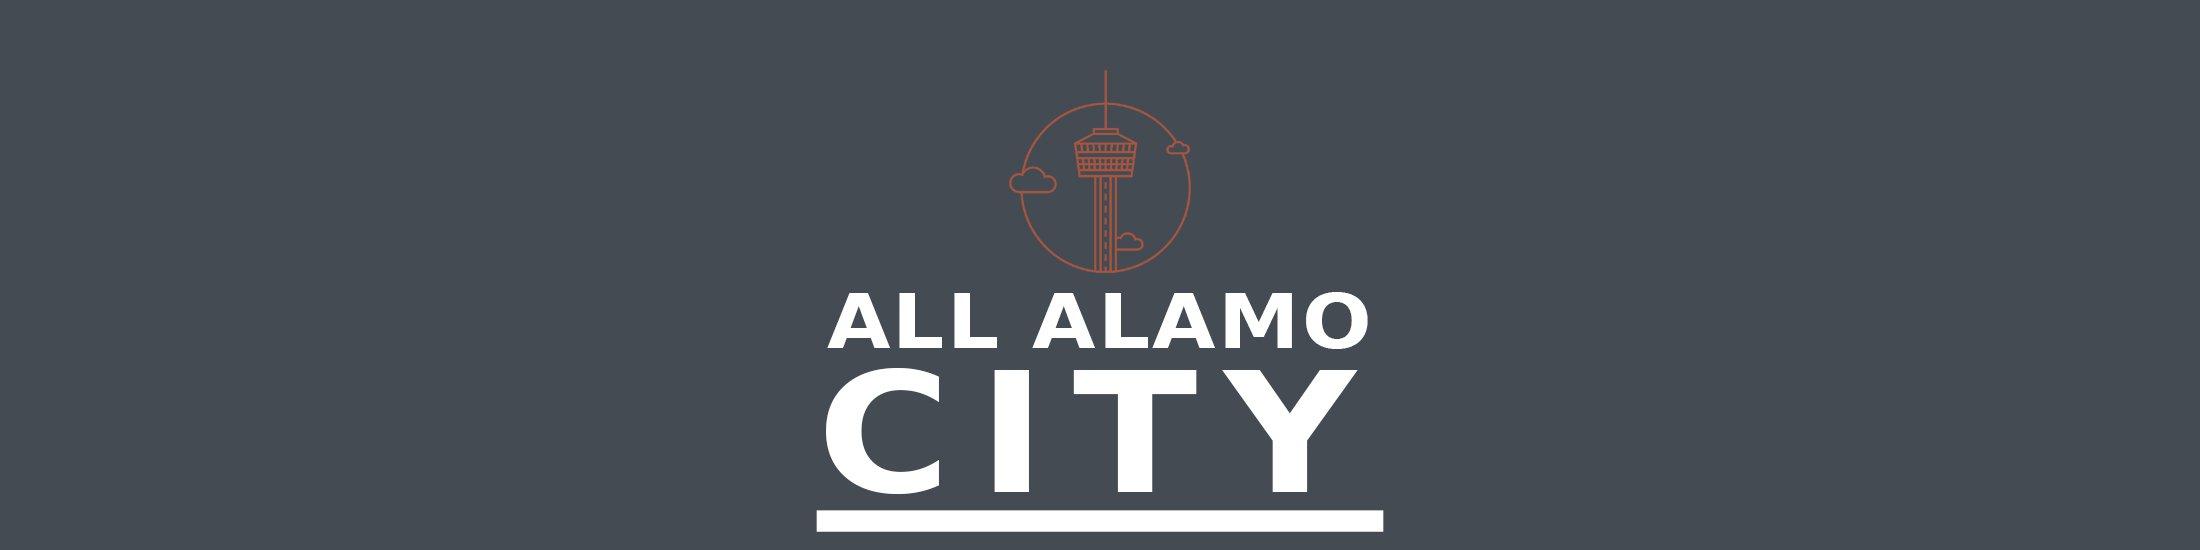 All Alamo City